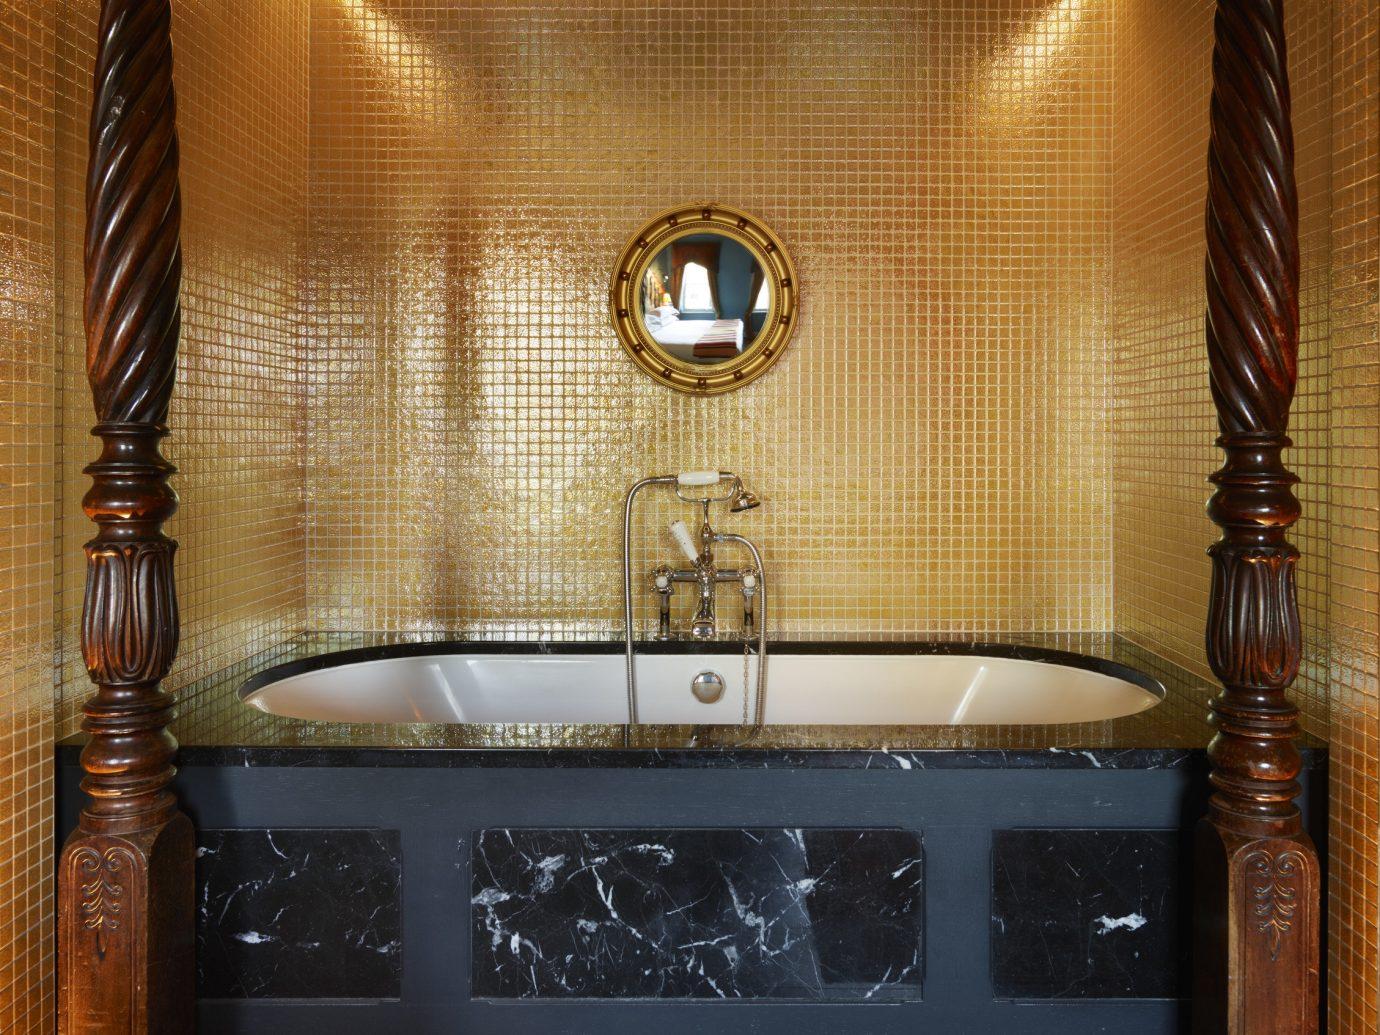 Boutique Hotels Hotels indoor room interior design furniture flooring bathroom wood floor ceiling sink tile